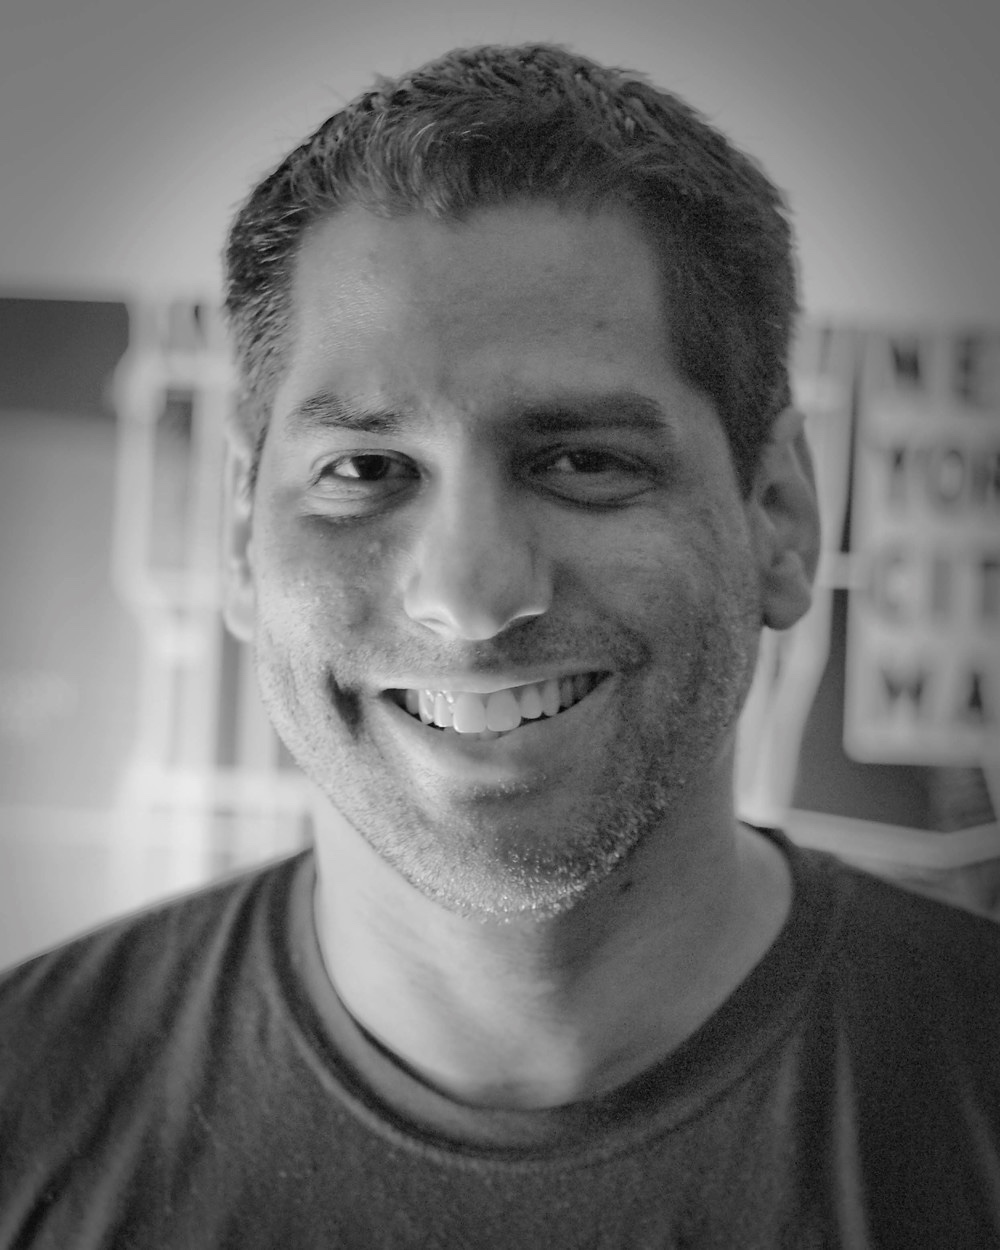 PRODUCER | LUIS EDUARDO VILLAMIZAR